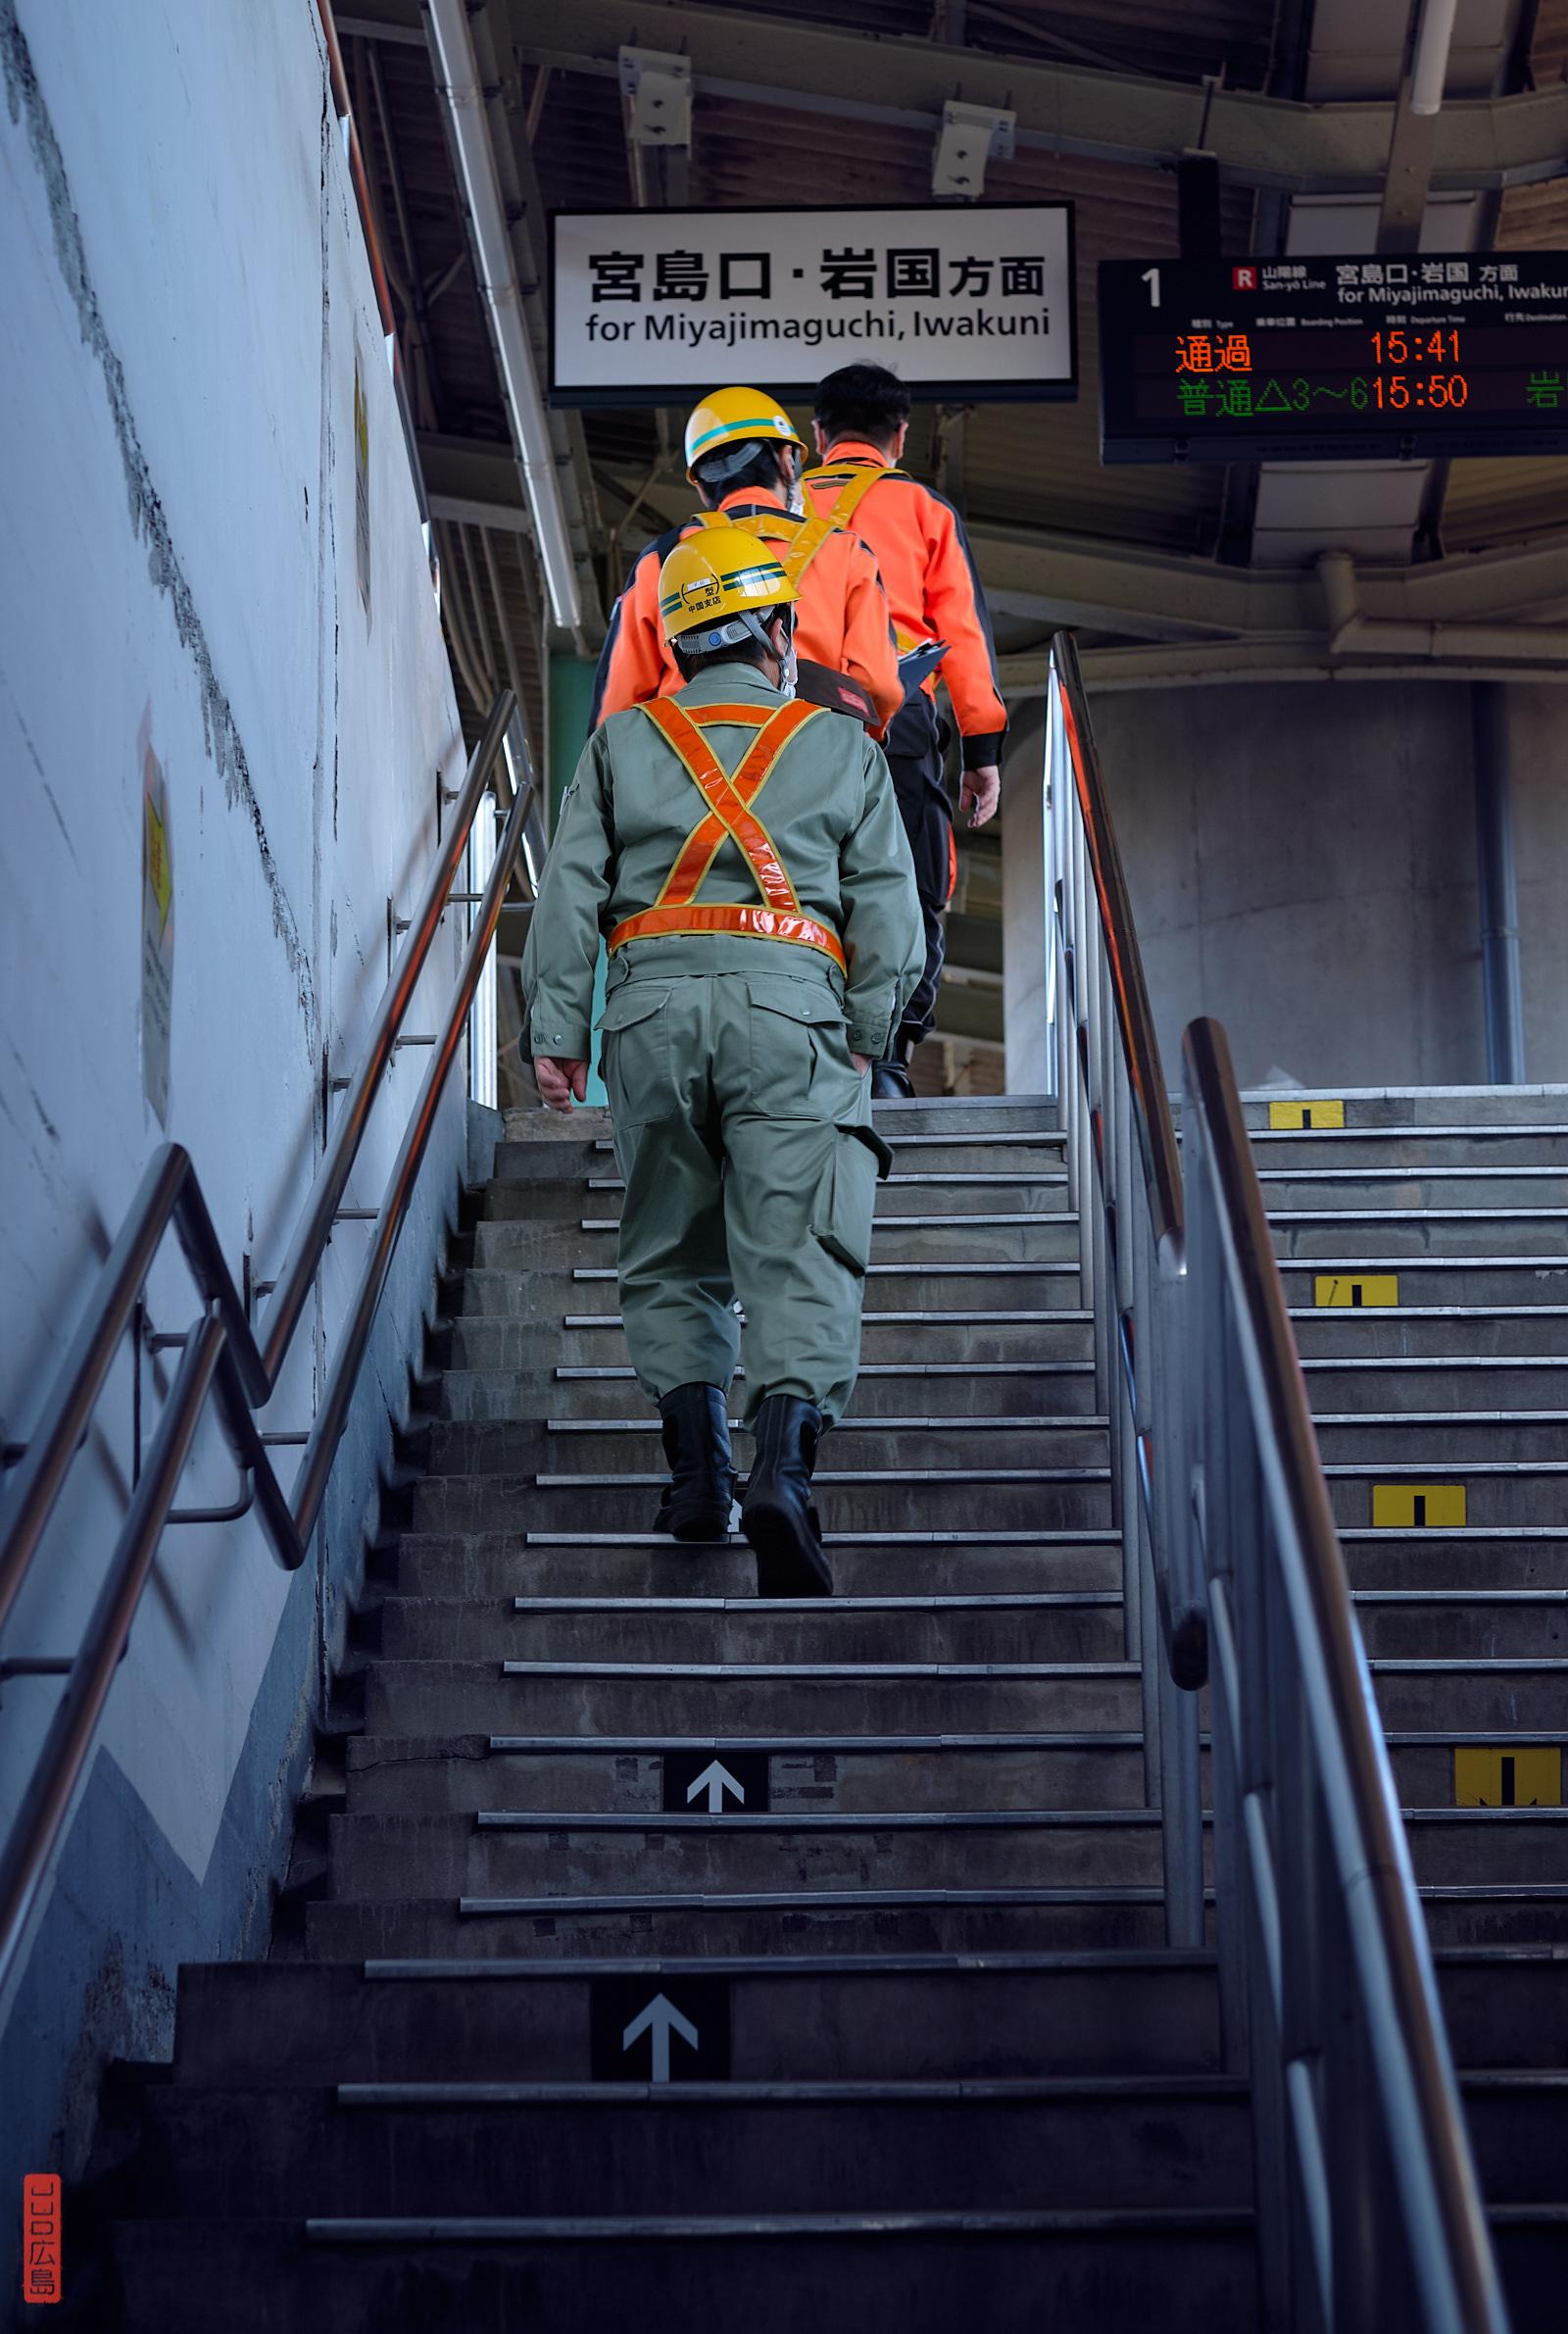 Travailleurs en uniforme de travail, gare de Yokogawa, Japon